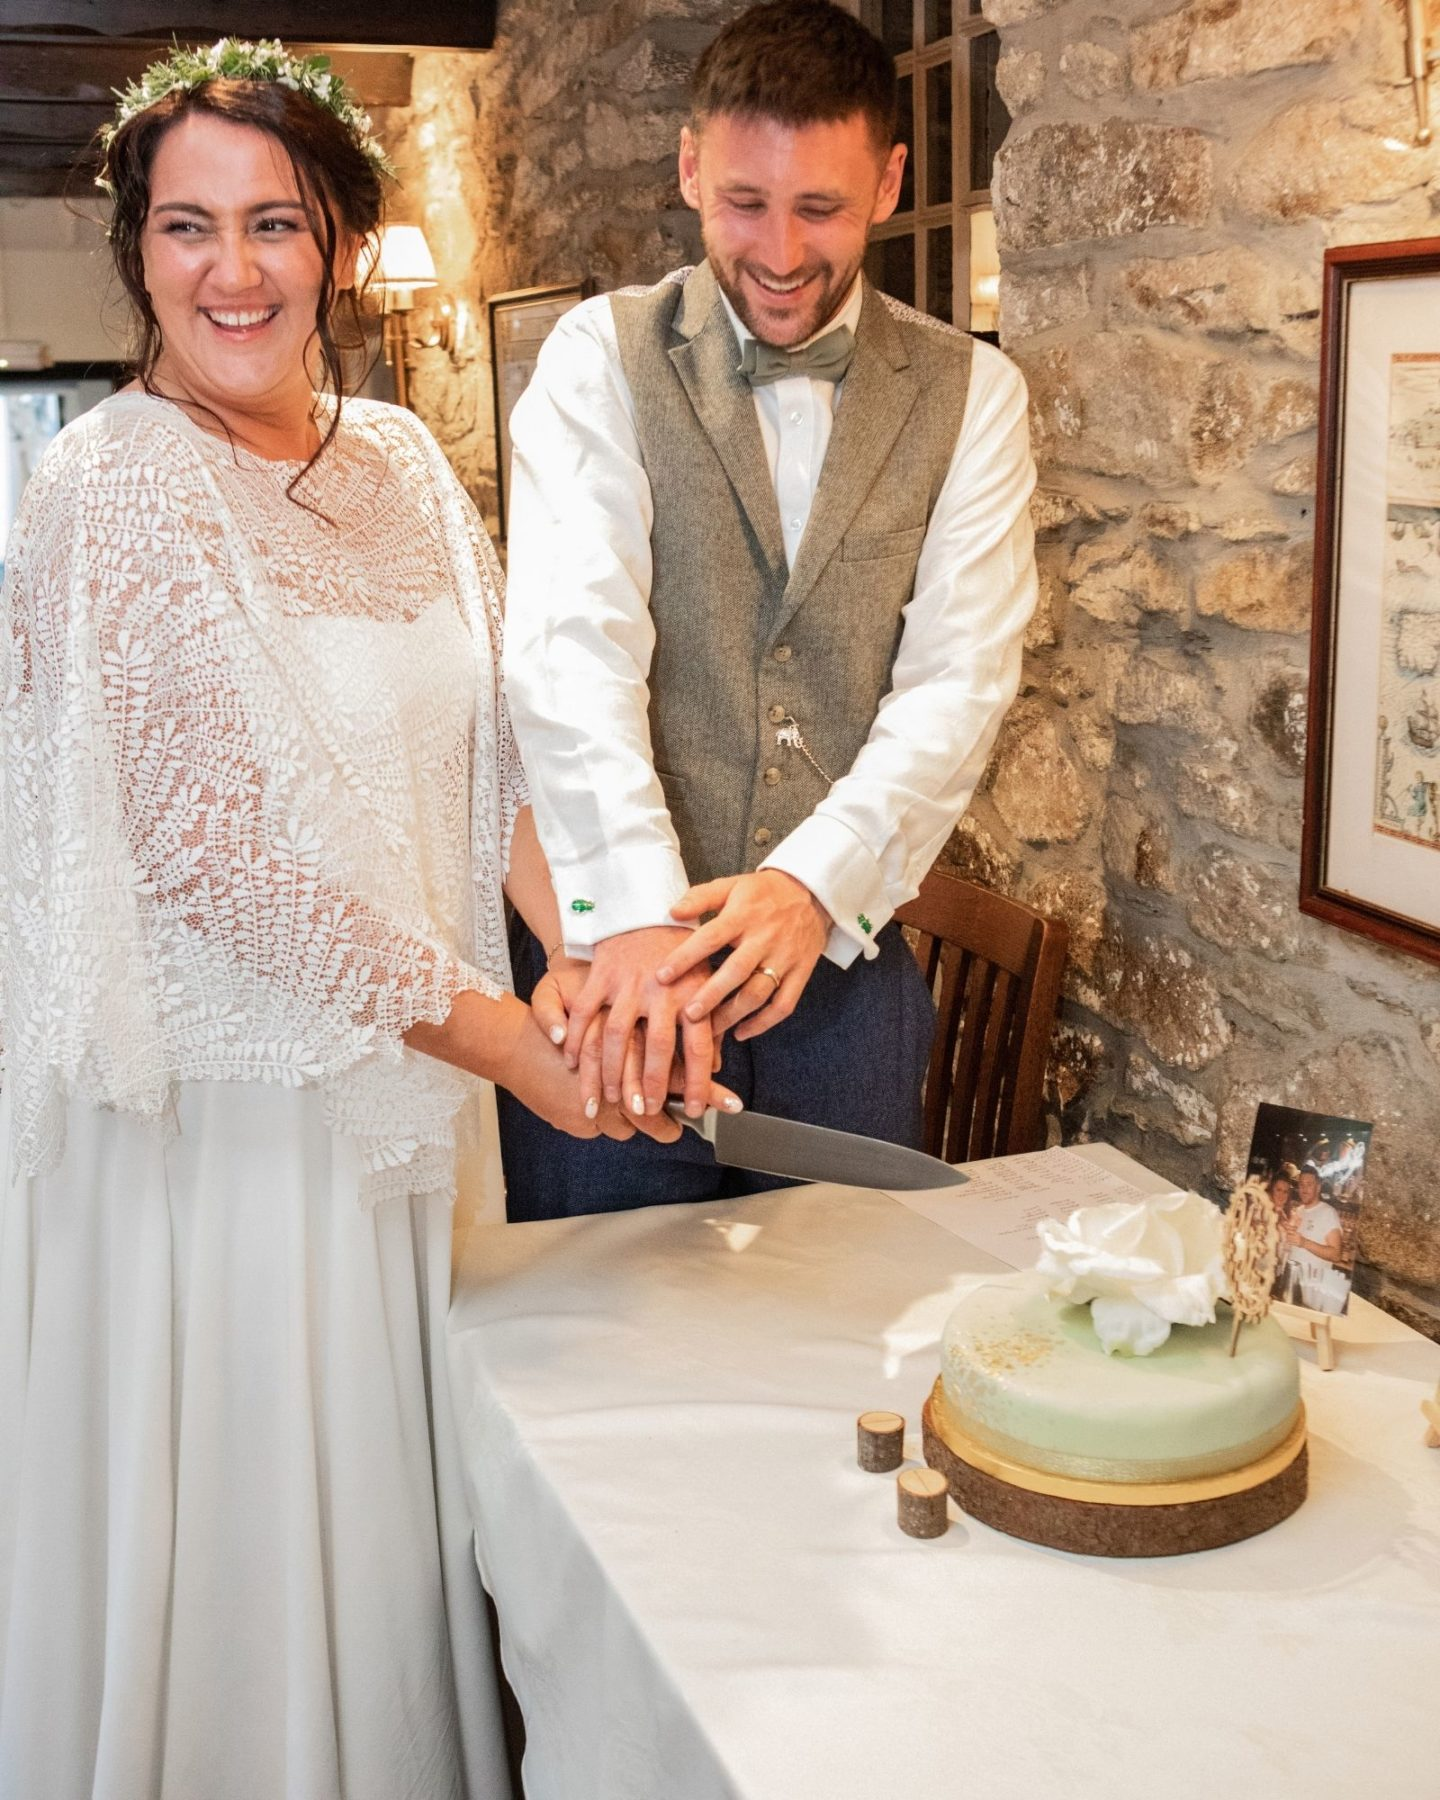 Bohemian wedding bespoke boho wedding dress